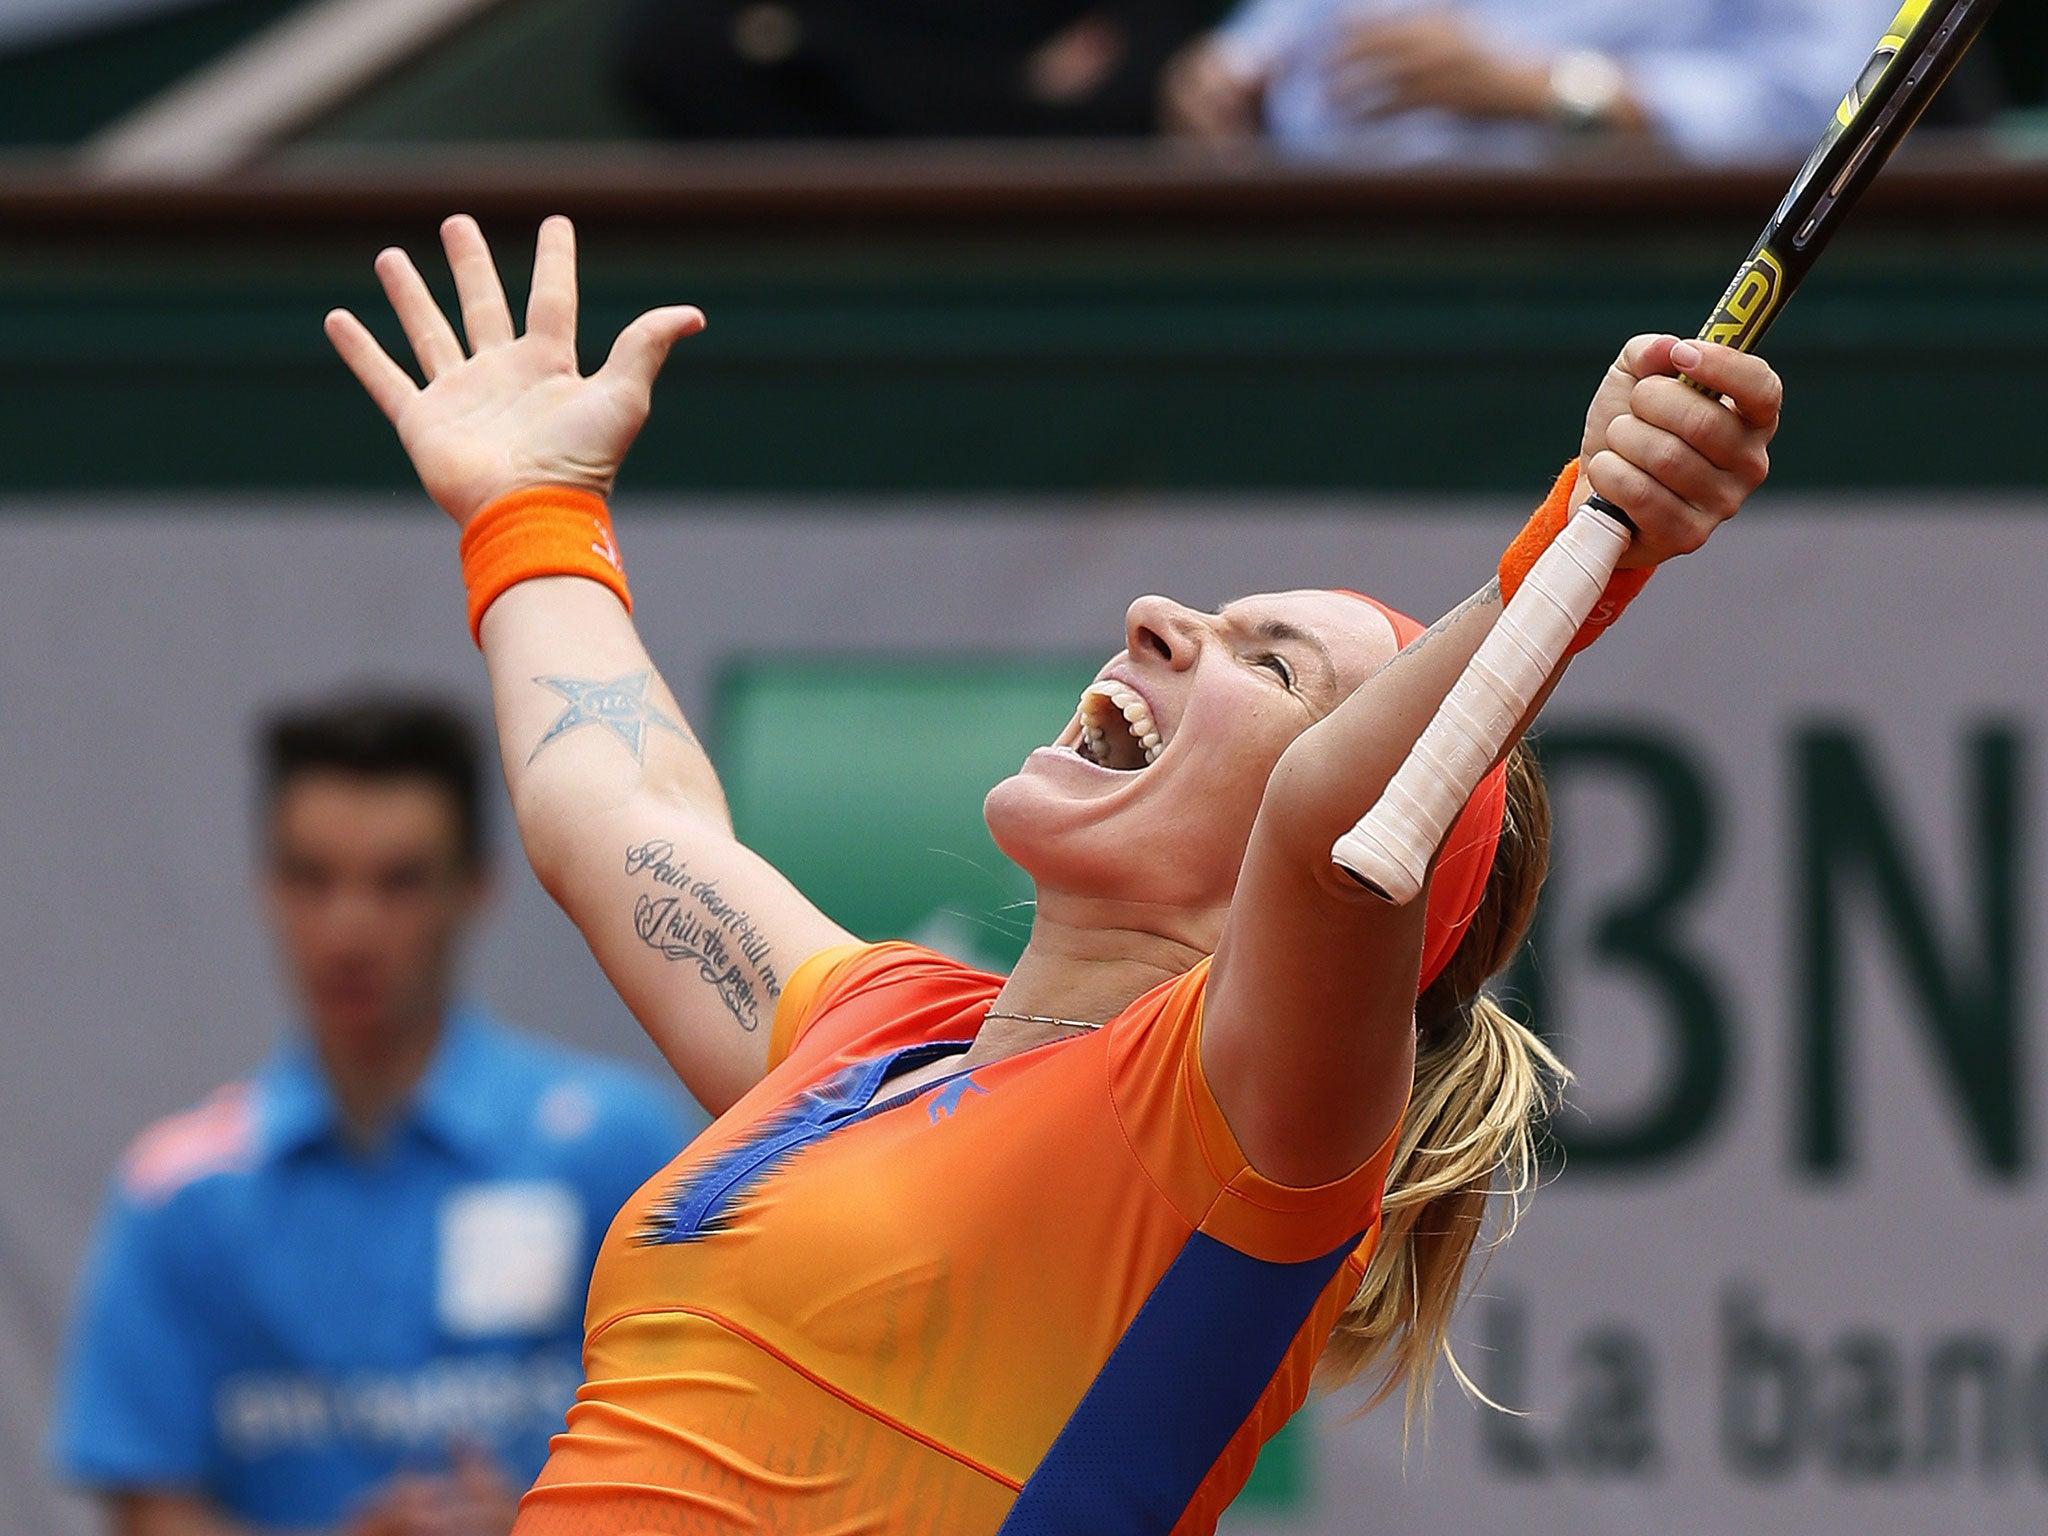 French Open 2014 Latest epic win moves Svetlana Kuznetsova from